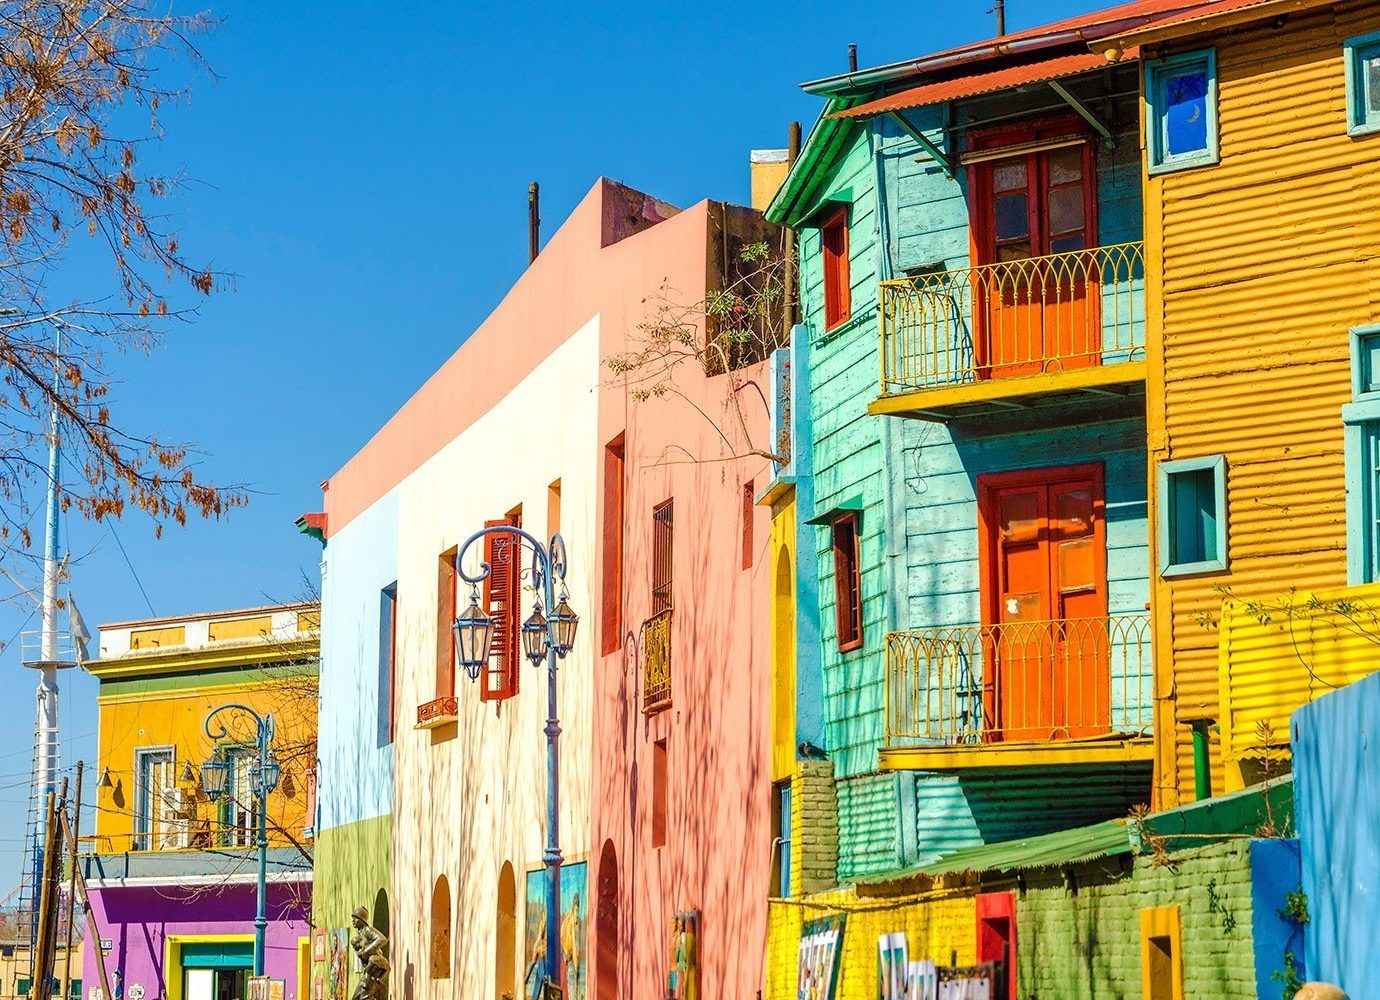 Trip Ideas outdoor sky color house Town neighbourhood human settlement facade Architecture residential area estate cityscape